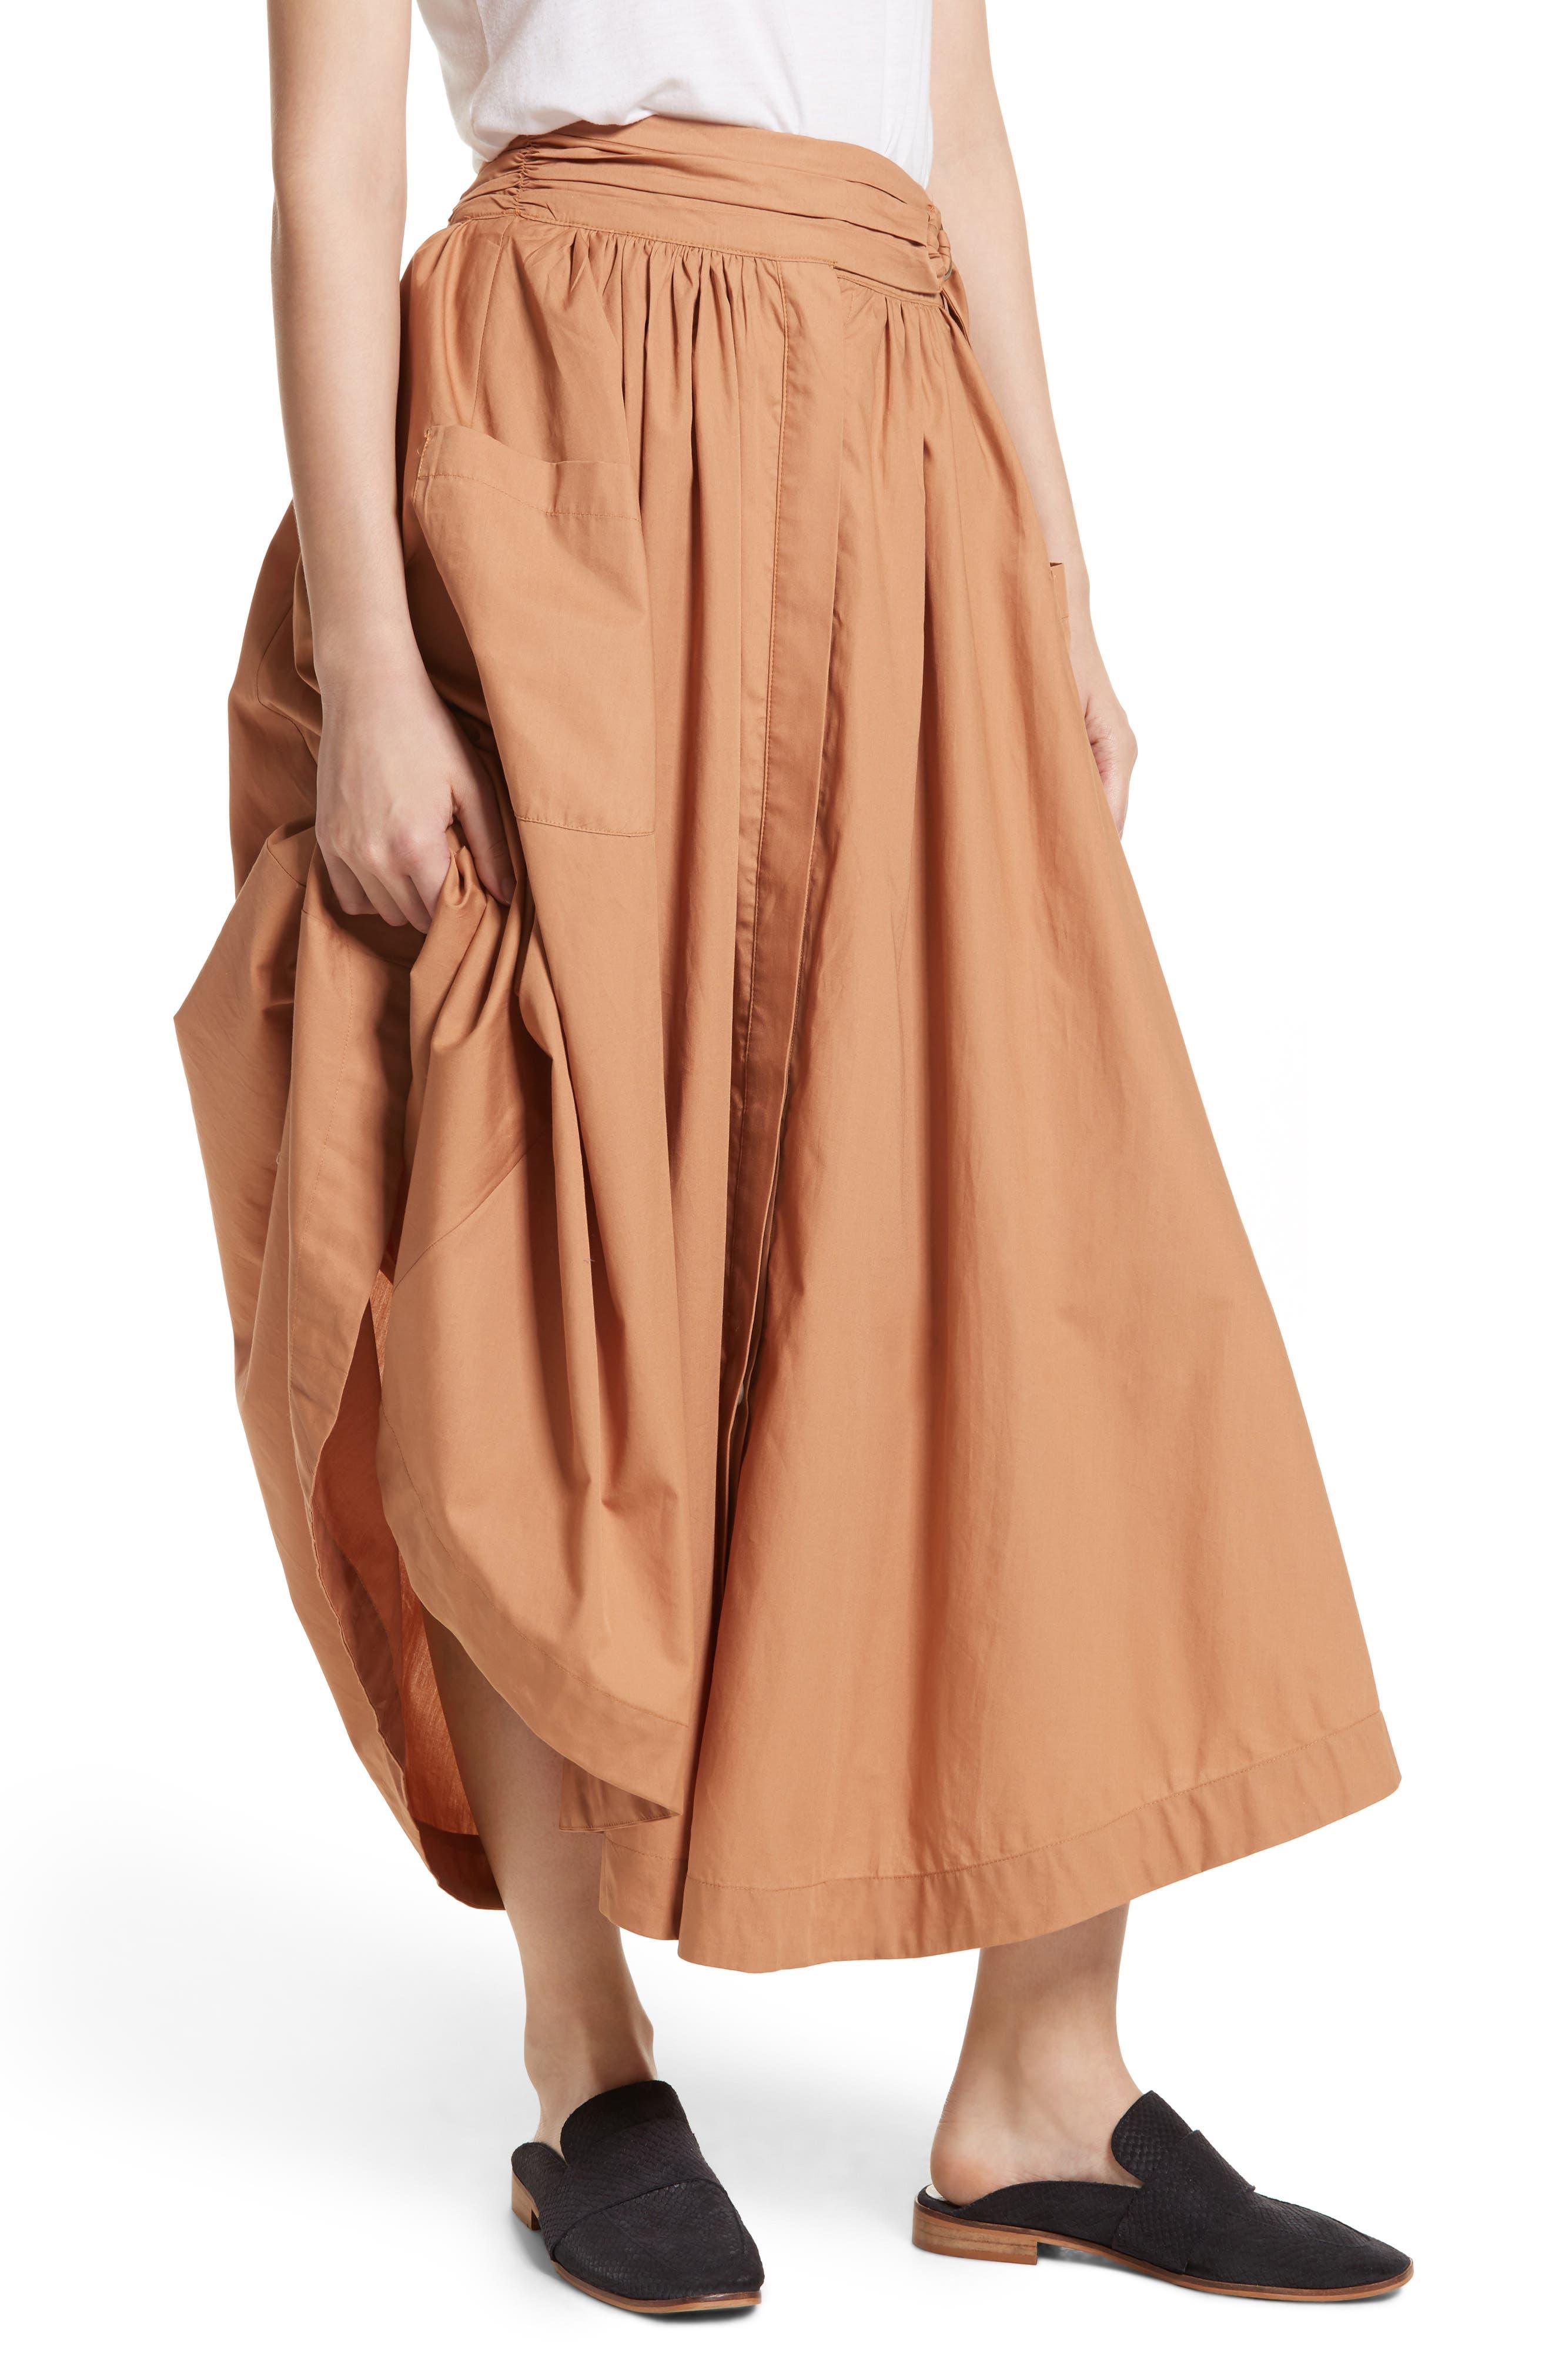 Dream of Me Midi Skirt,                         Main,                         color, 230